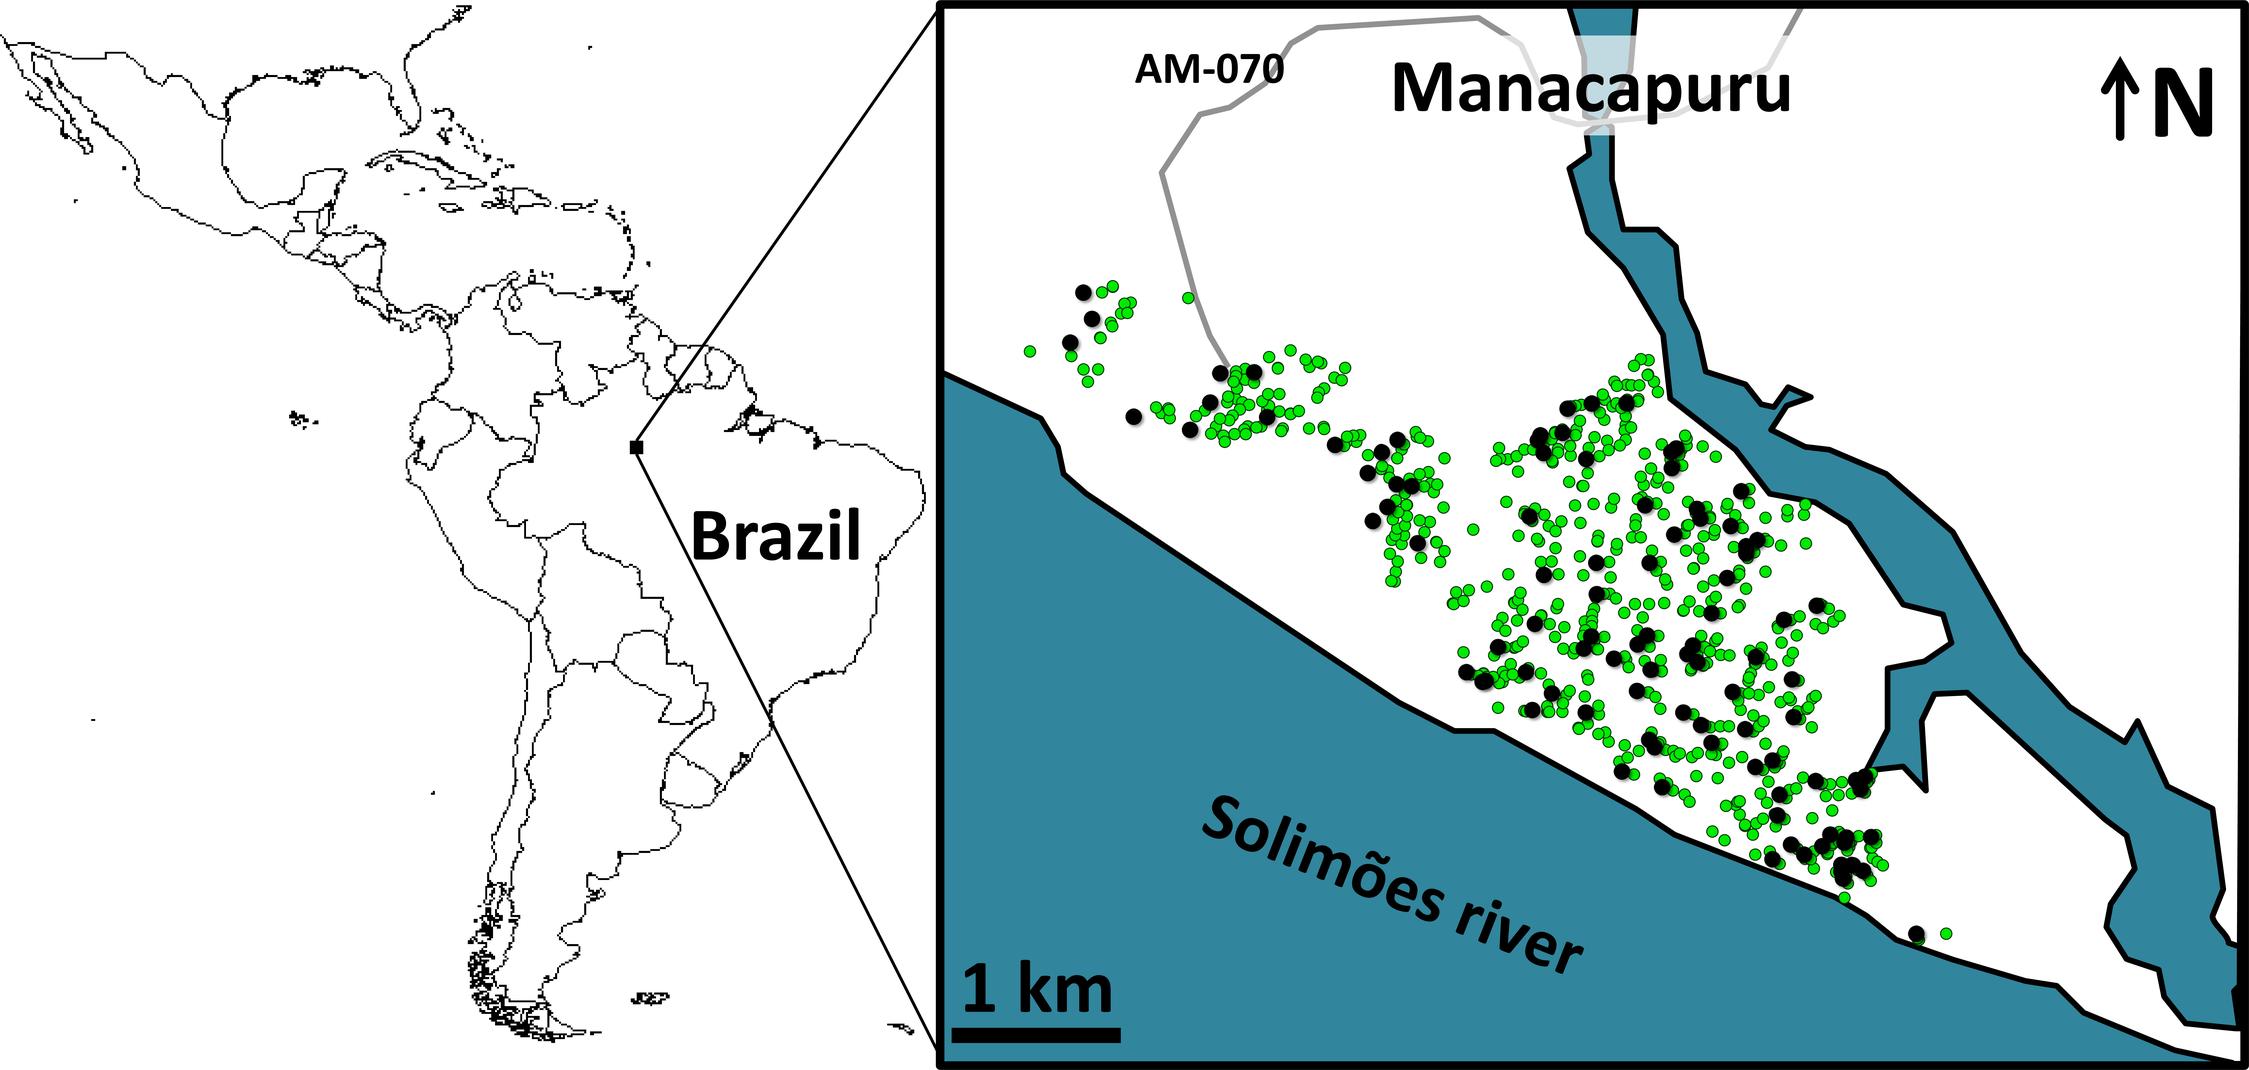 Study site: the city of Manacapuru, state of Amazonas, Brazil.